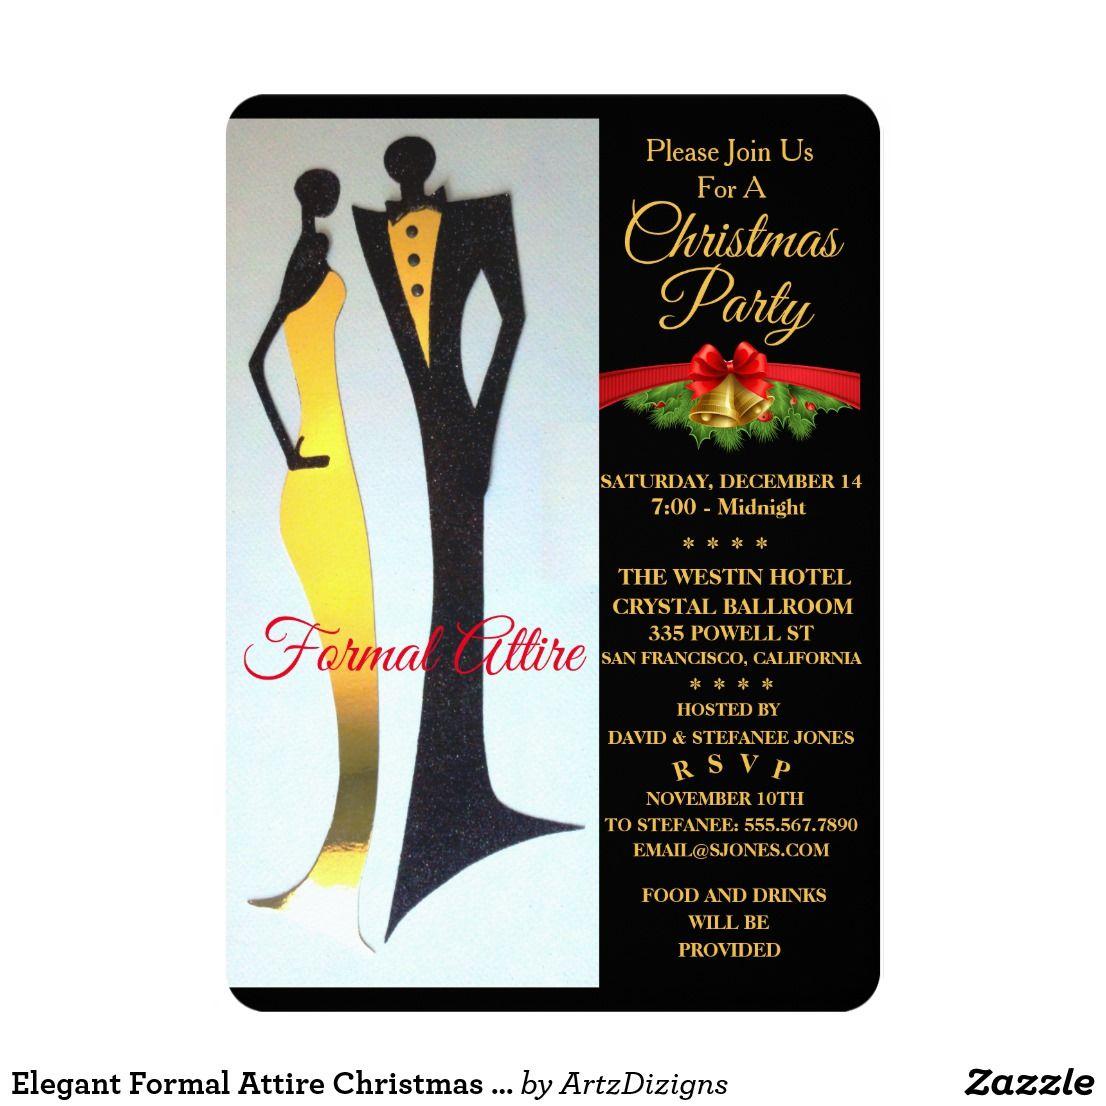 Elegant Formal Attire Christmas Party Invitation